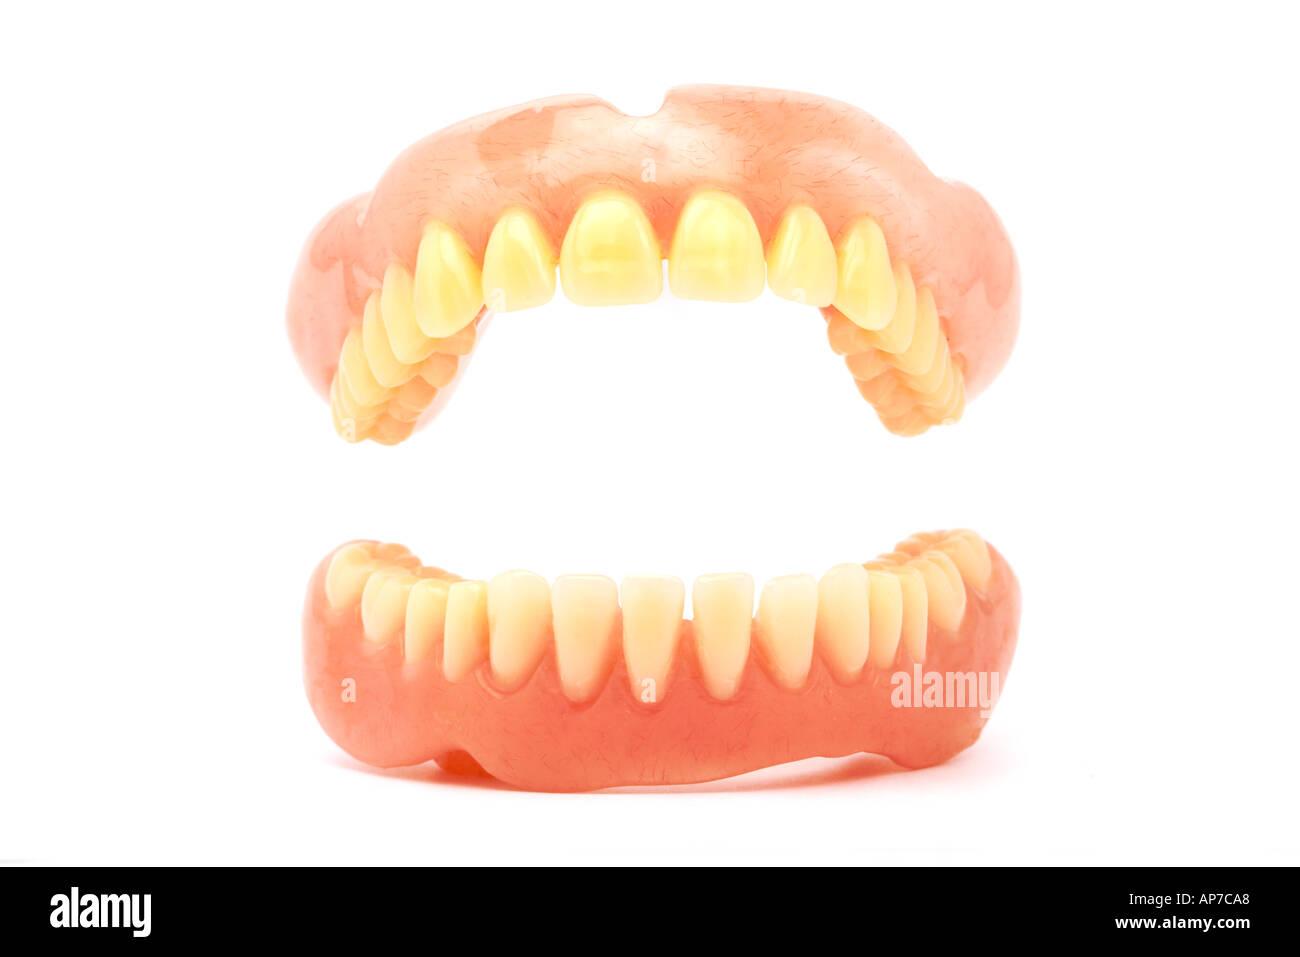 False Teeth open mouth  - Stock Image